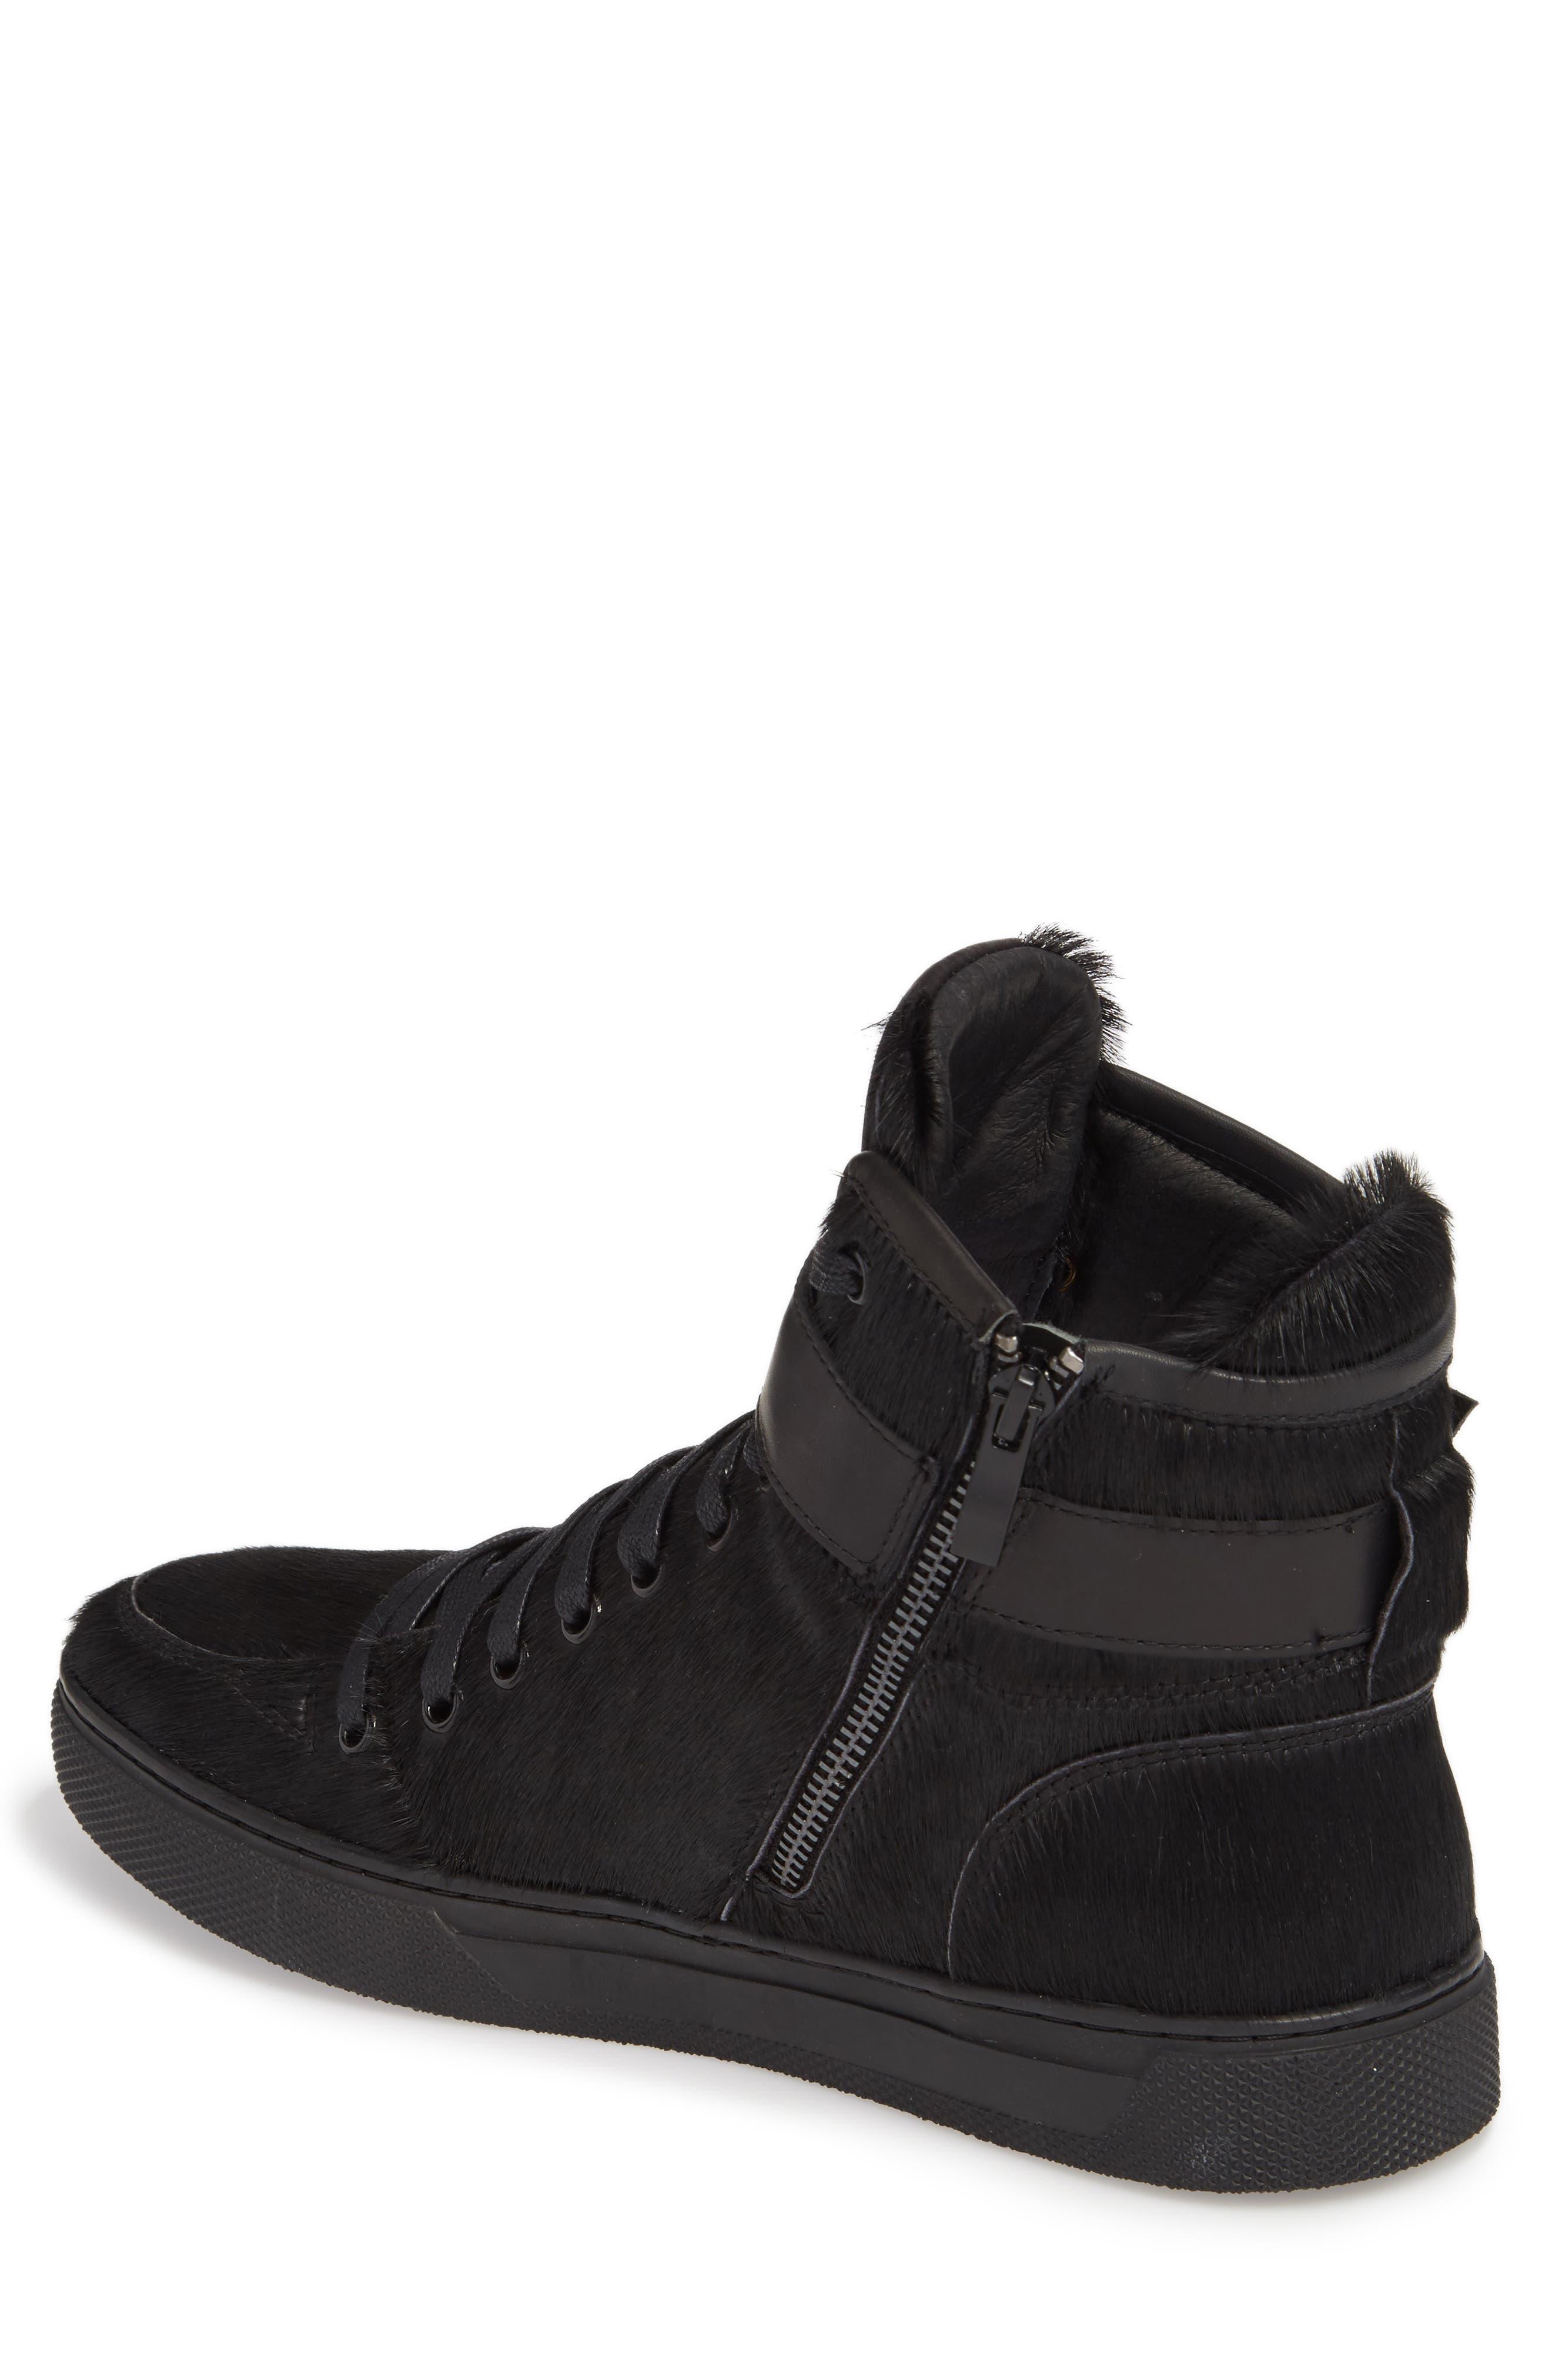 Sullivan Genuine Calf Hair High Top Sneaker,                             Alternate thumbnail 2, color,                             002